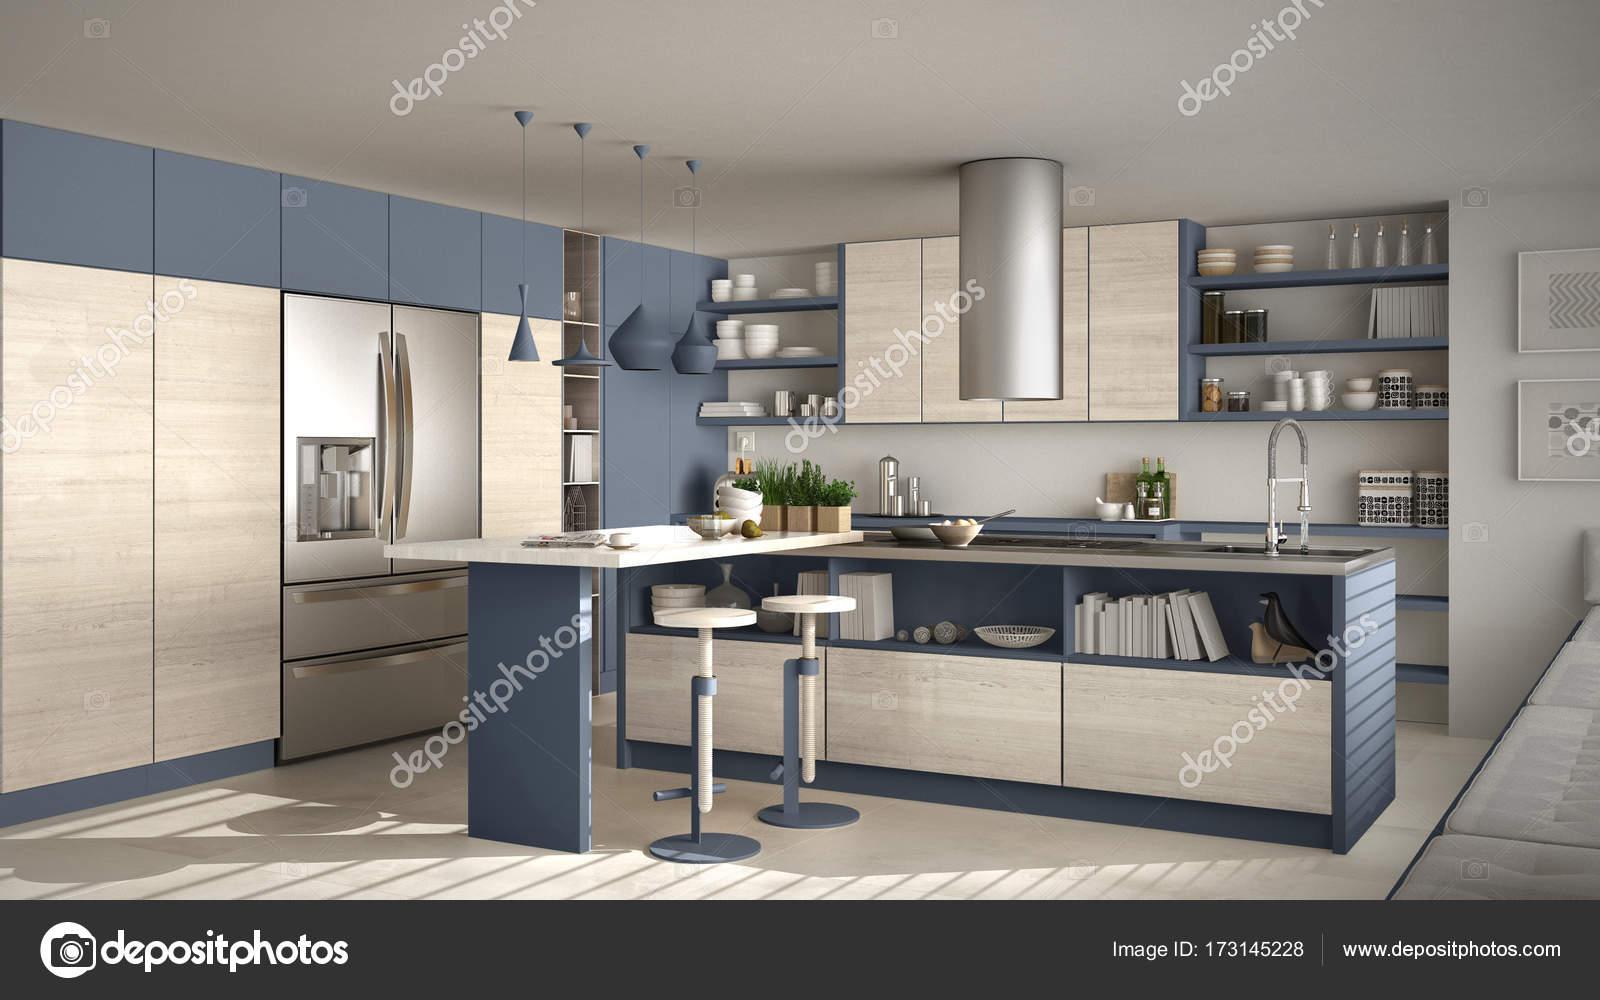 Cucina moderna in legno con dettagli in legno, bianchi e blu minimi ...